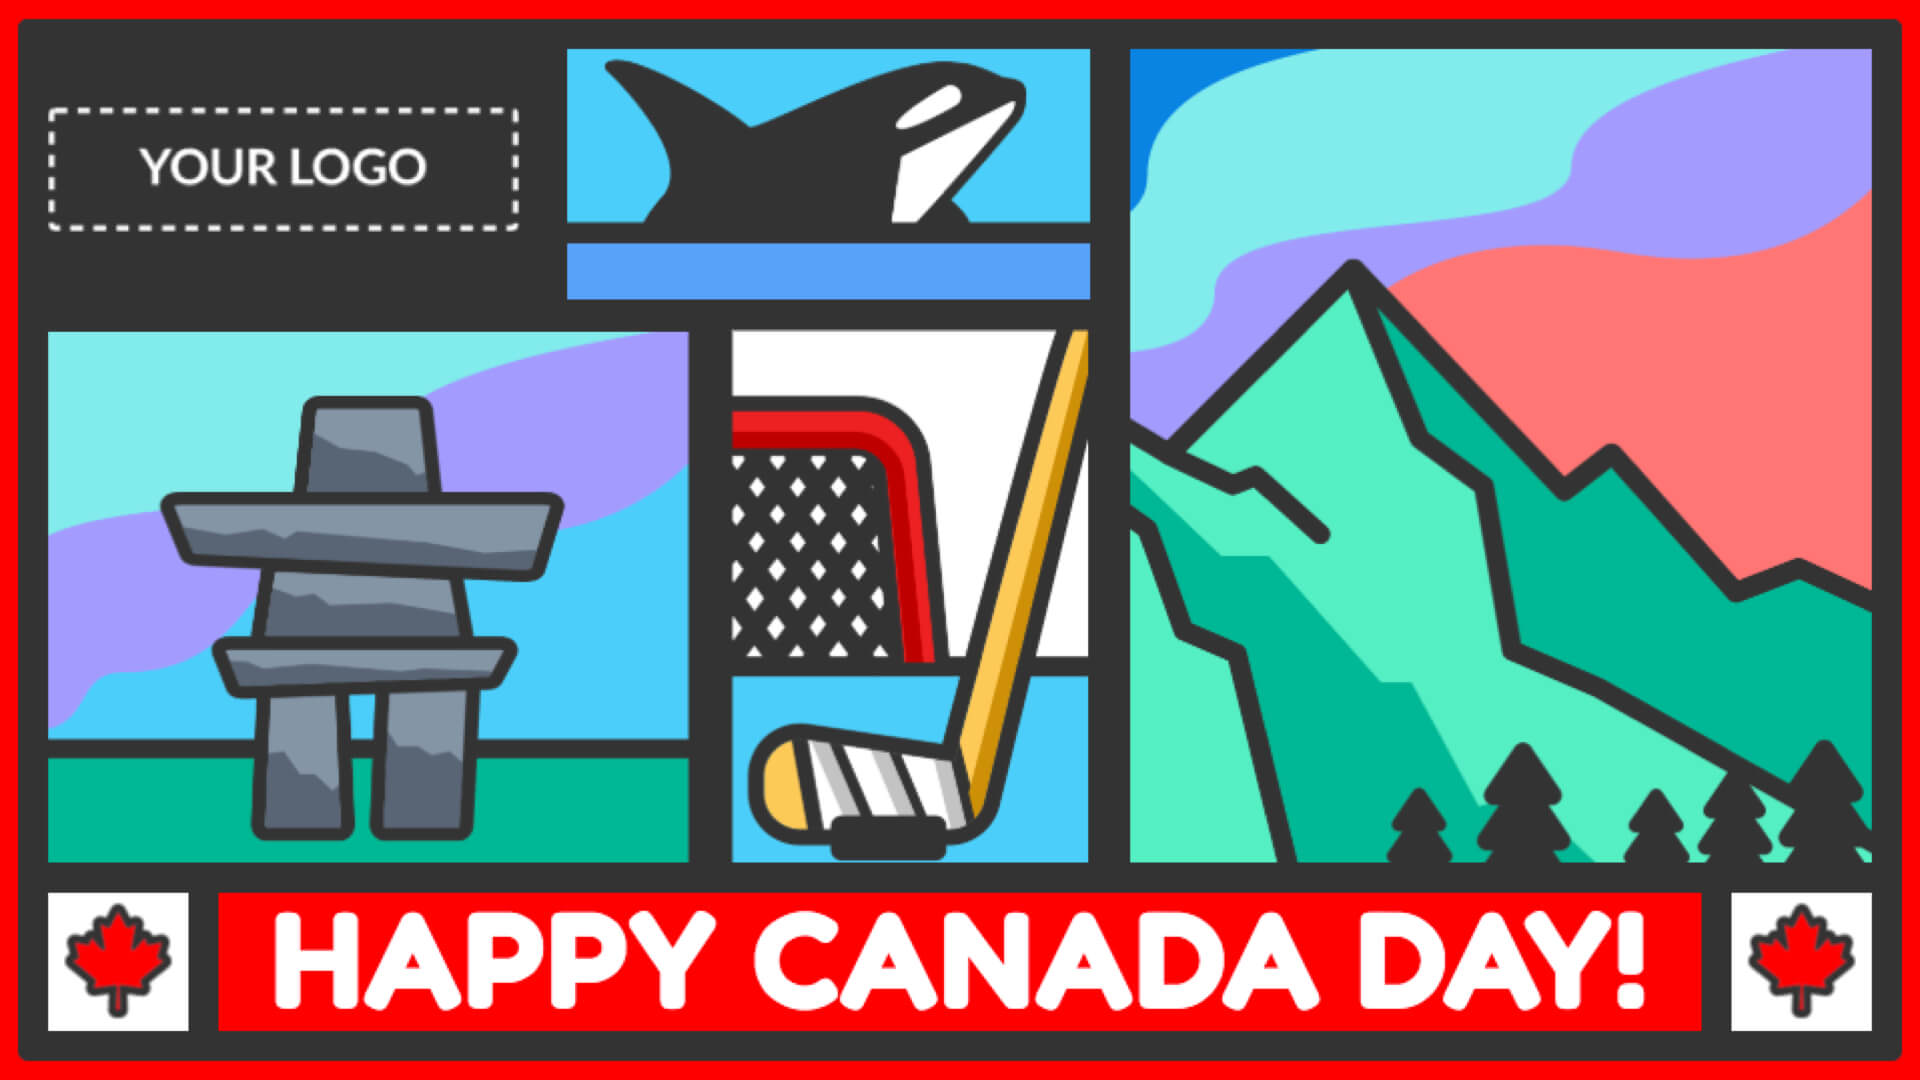 Canada Day Digital Signage Template